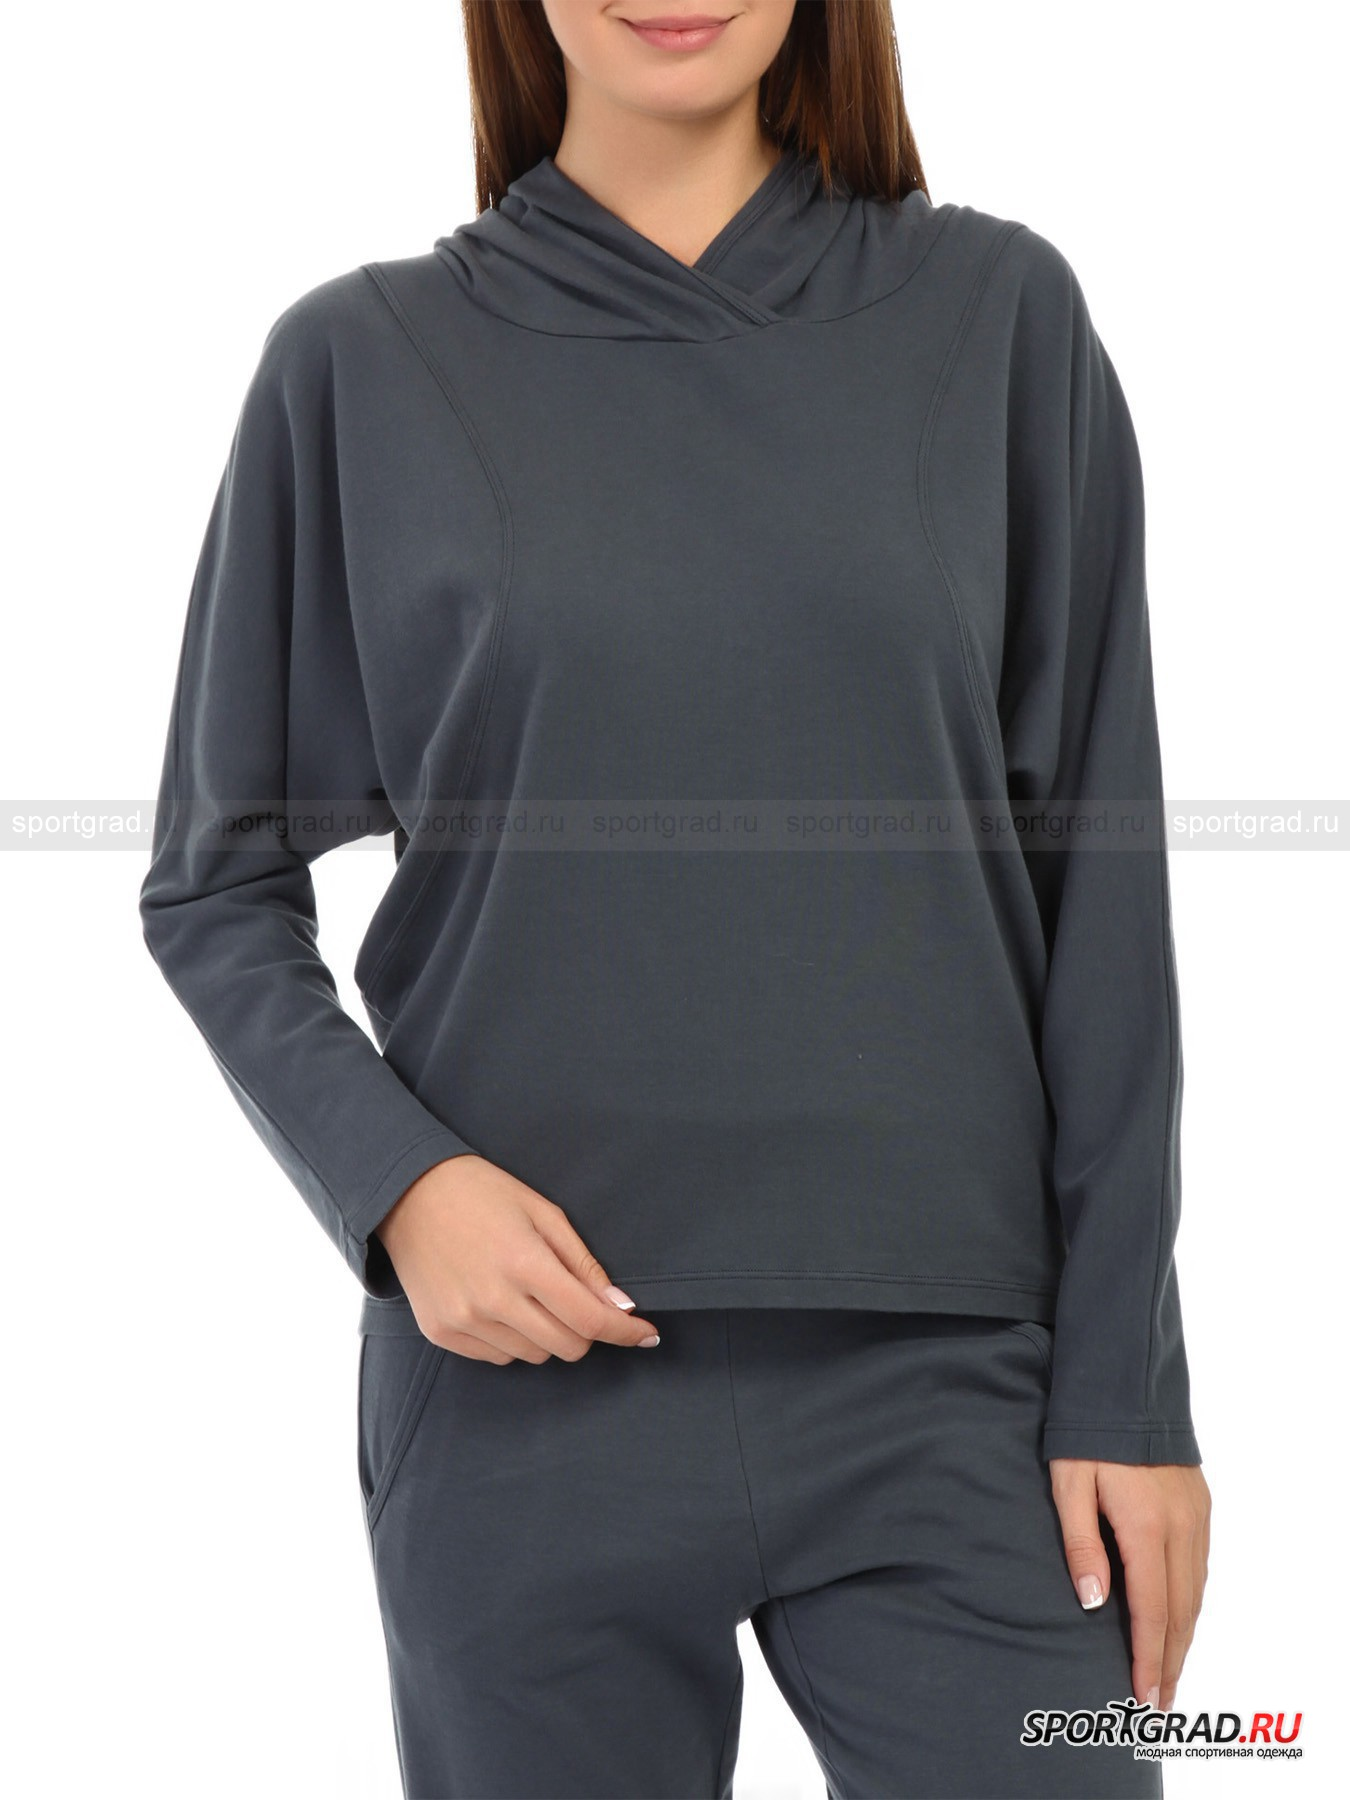 Толстовка женская Hooded Sweatshirt DEHA от Спортград